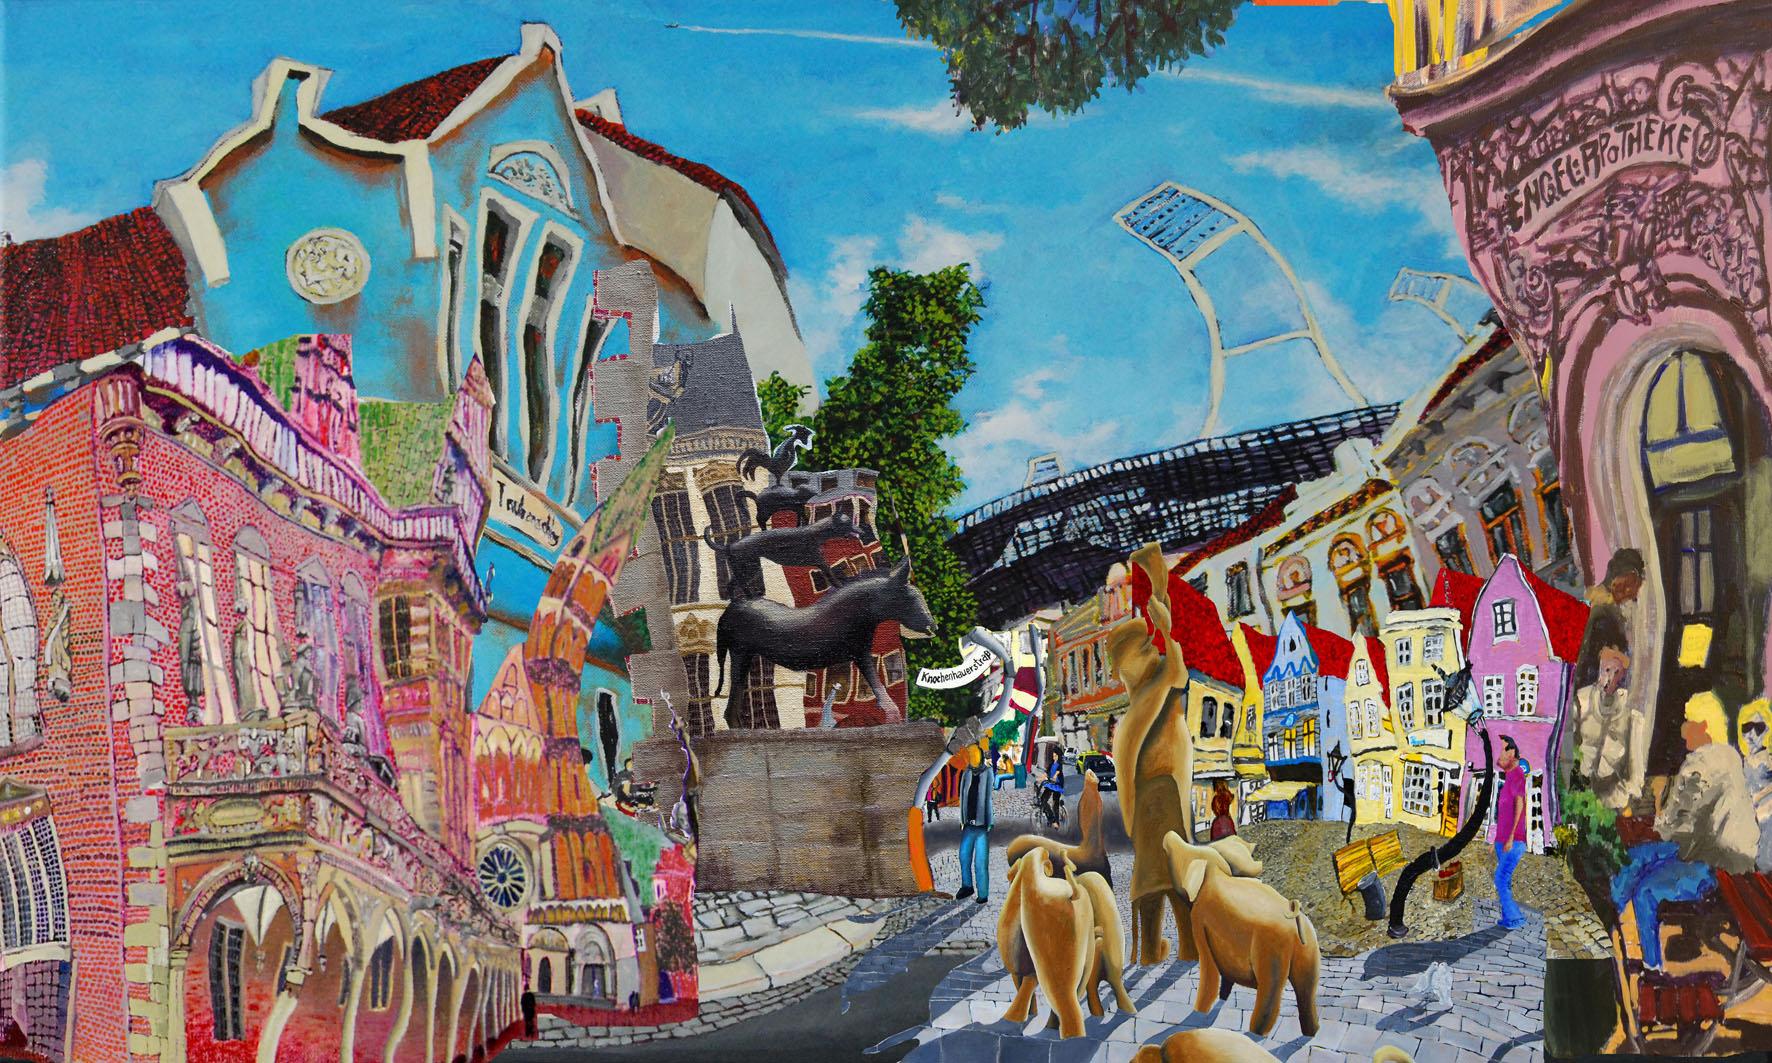 Collate de Todo Bremen/Digital-kunst-Collage(Als Reproduktion verfügbar)